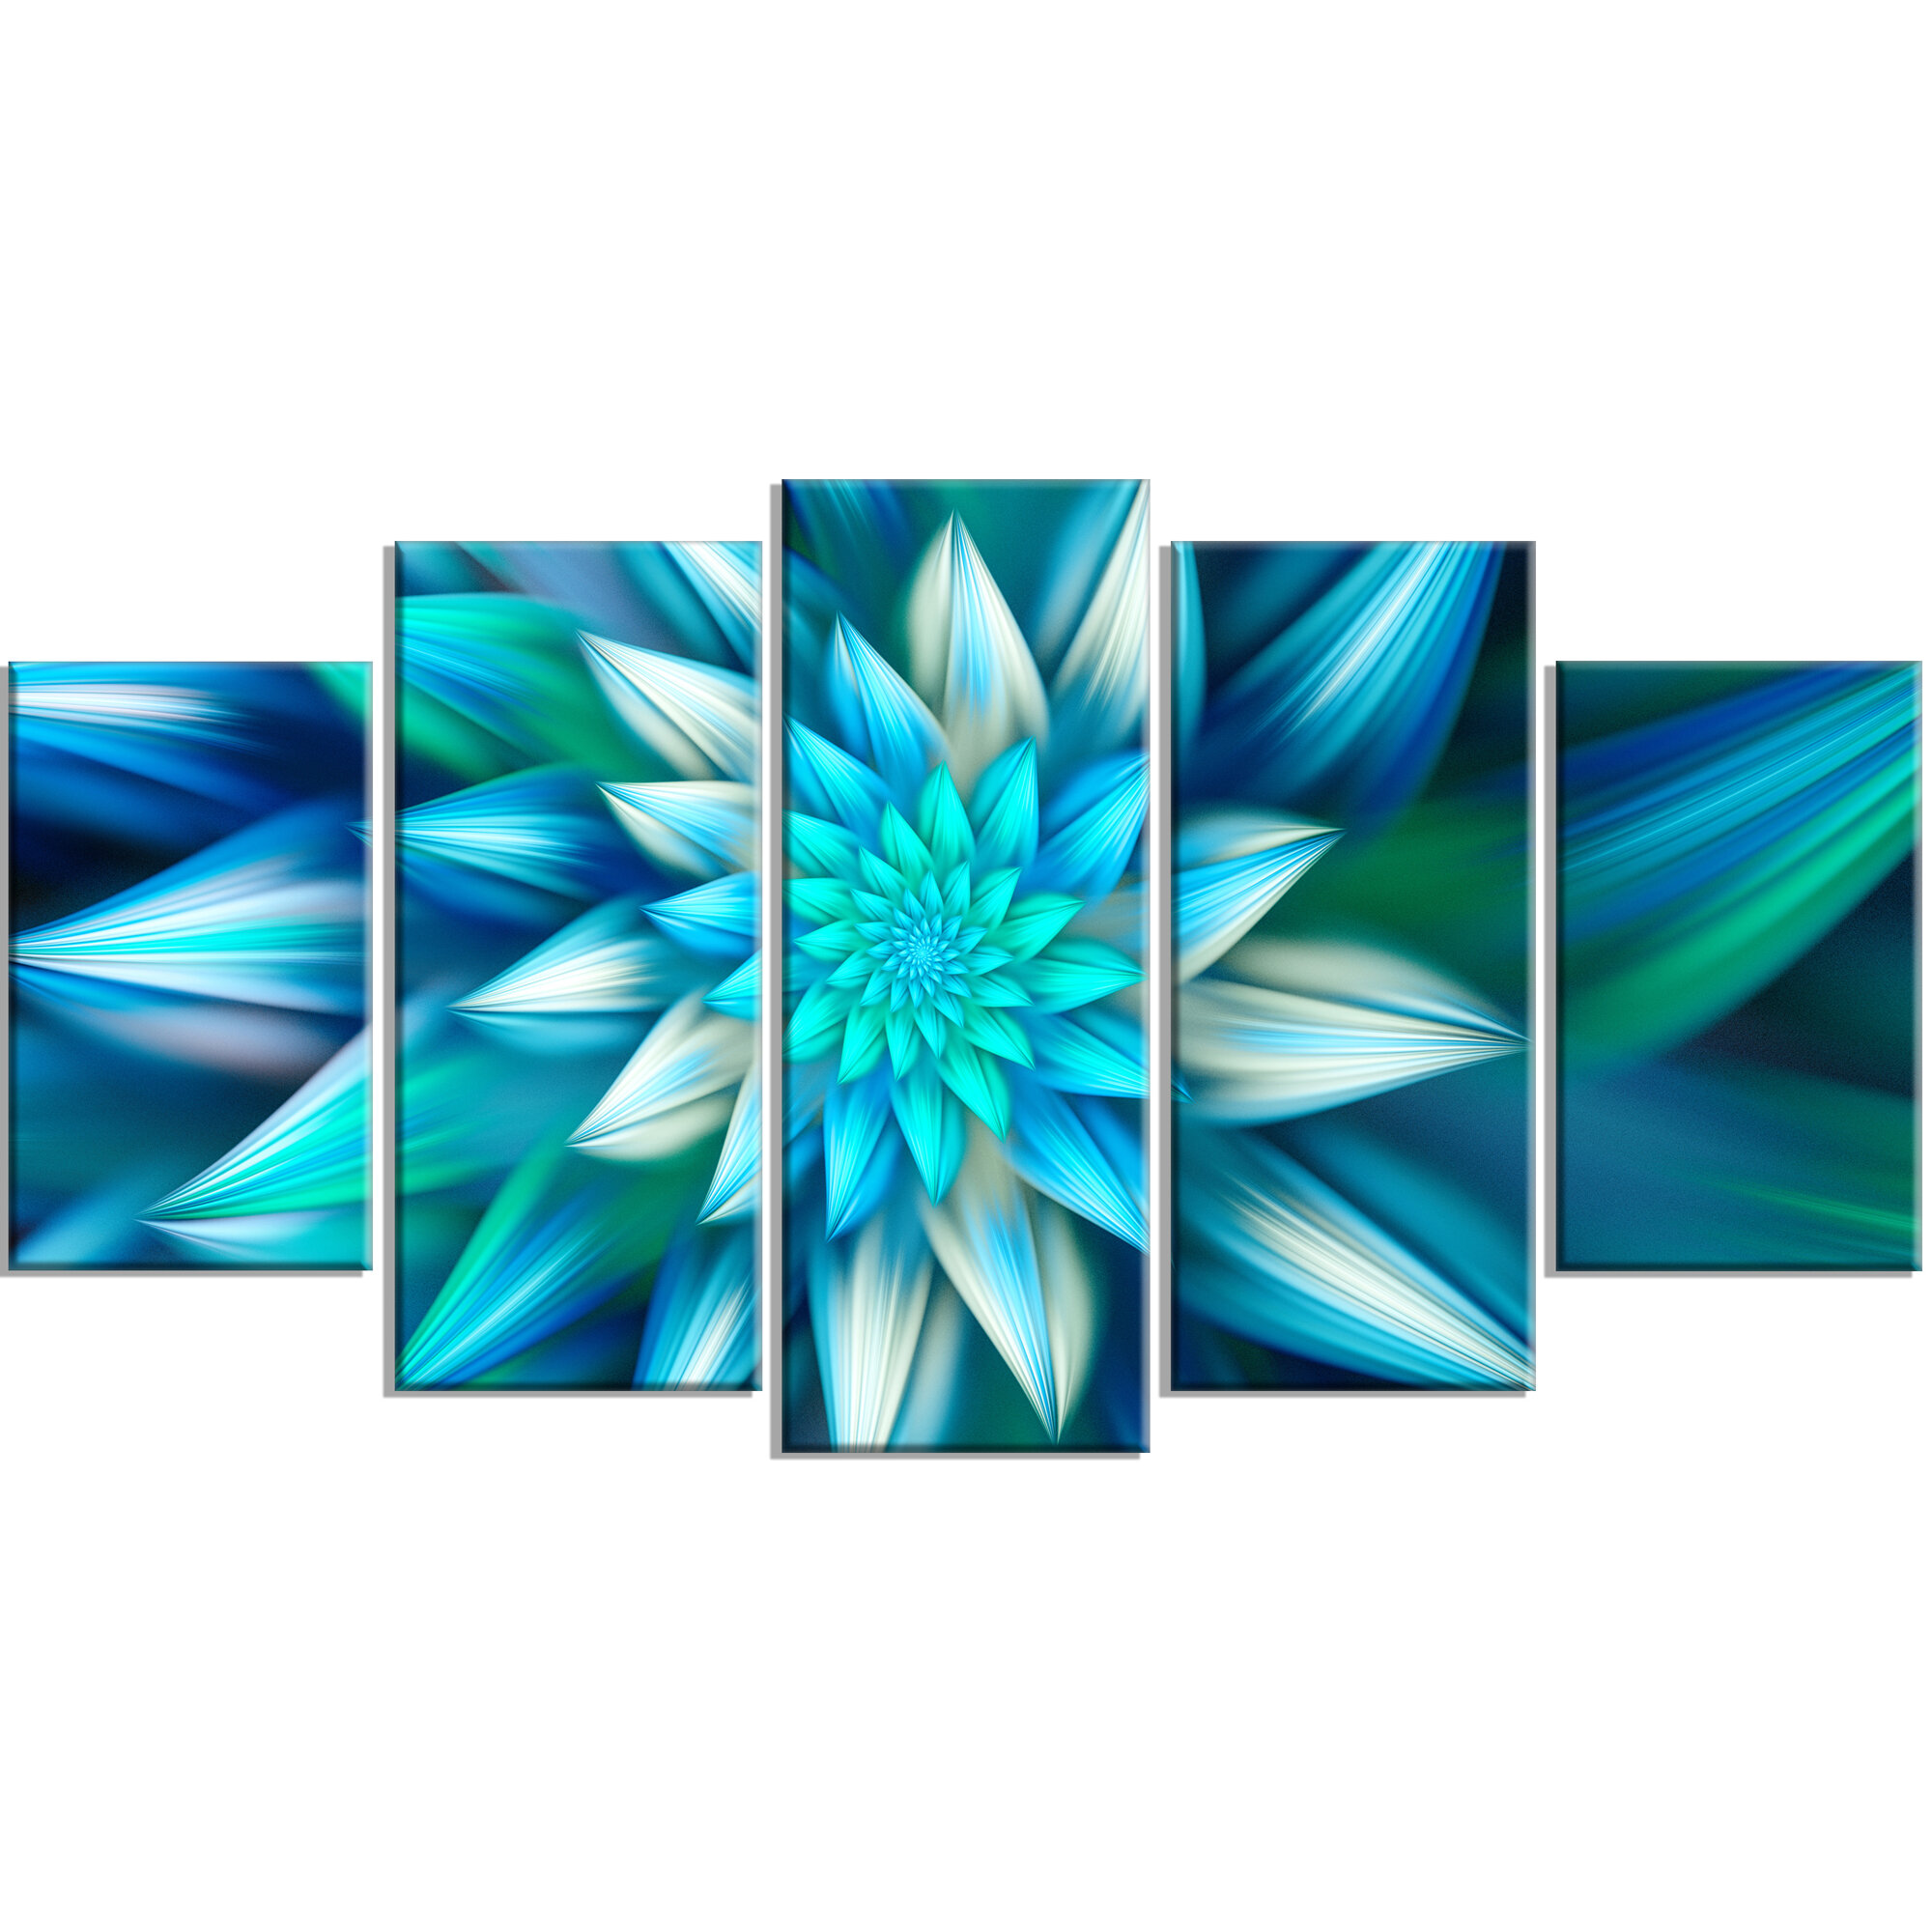 Designart Huge Blue Fractal Flower Graphic Art Print Multi Piece Image On Canvas Wayfair